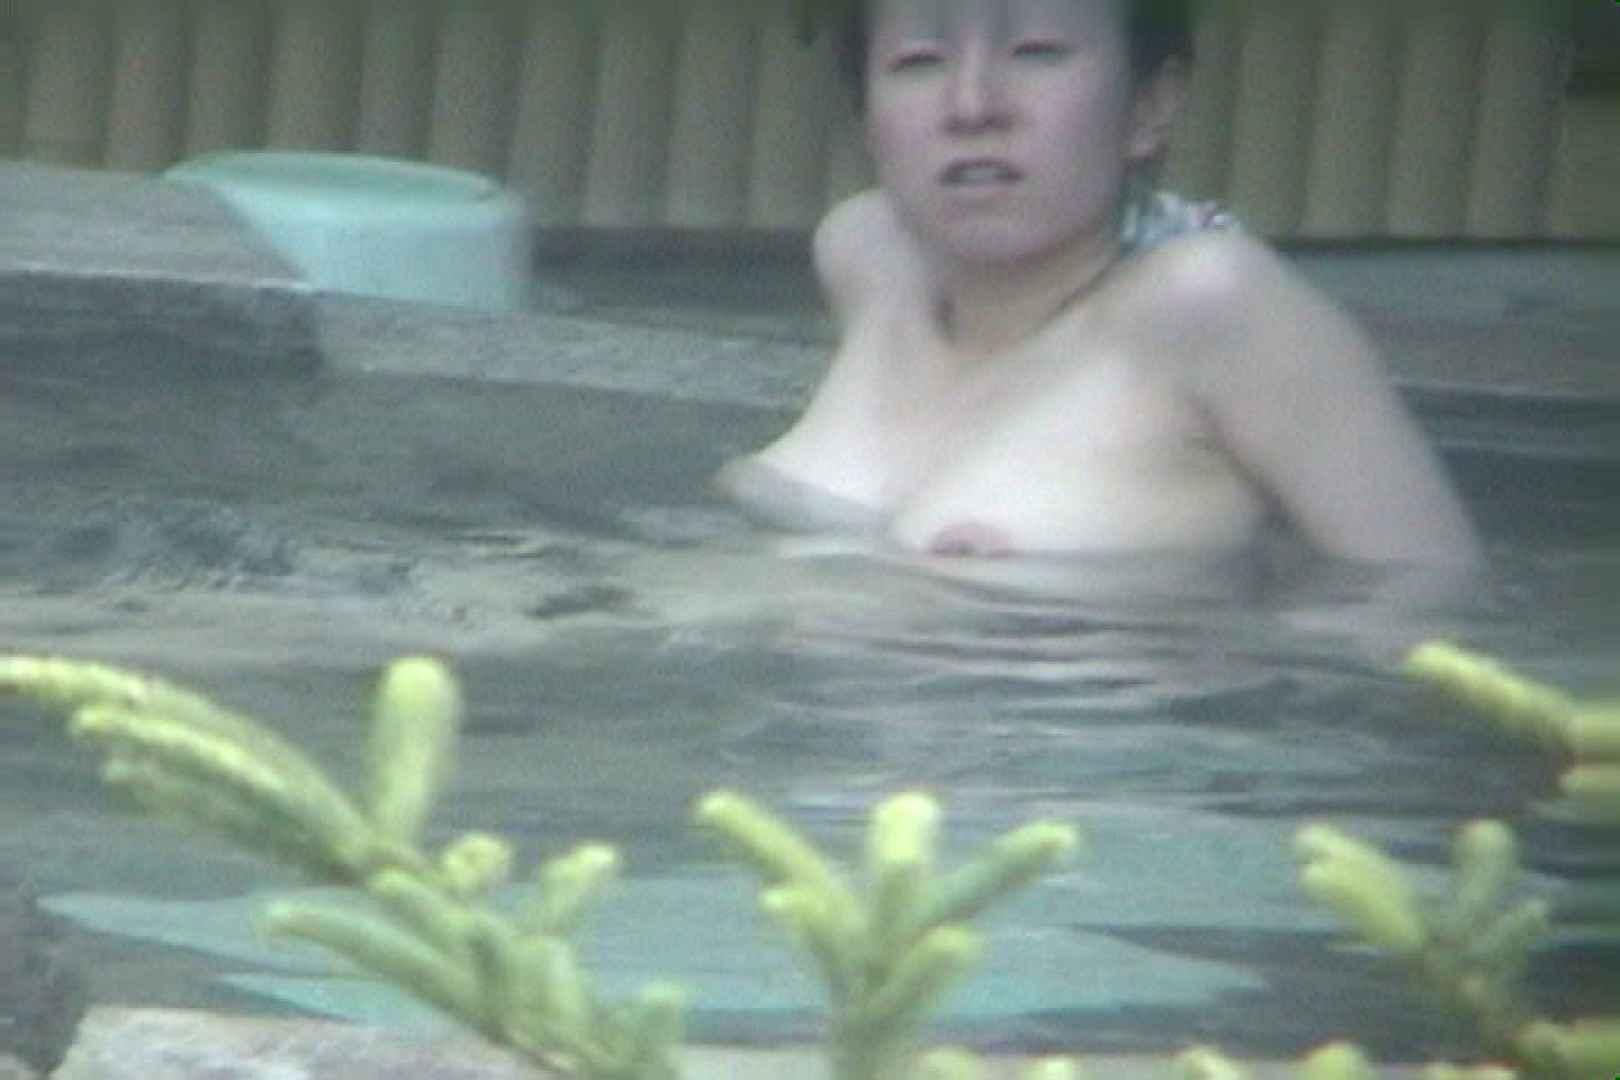 Aquaな露天風呂Vol.106 盗撮シリーズ | 露天風呂編  86PIX 13